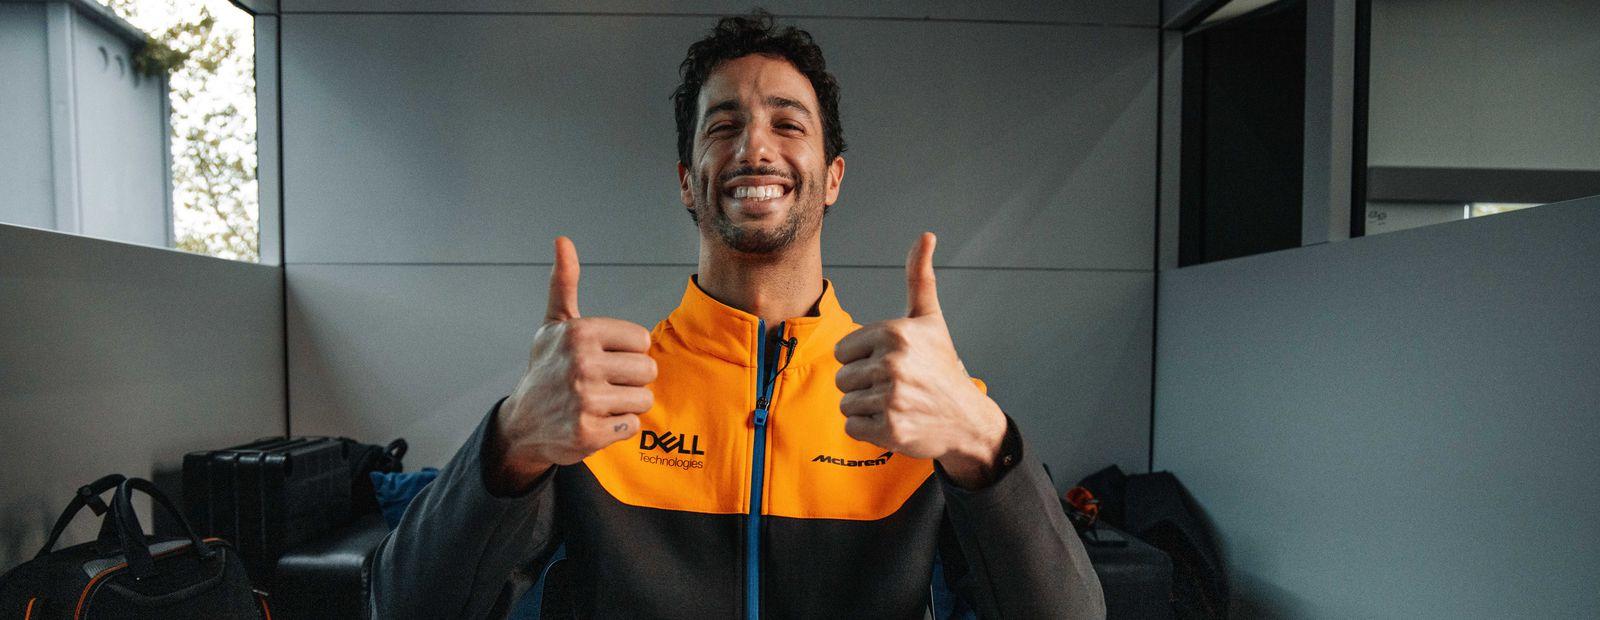 Daniel Ricciardo goes undercover on the internet